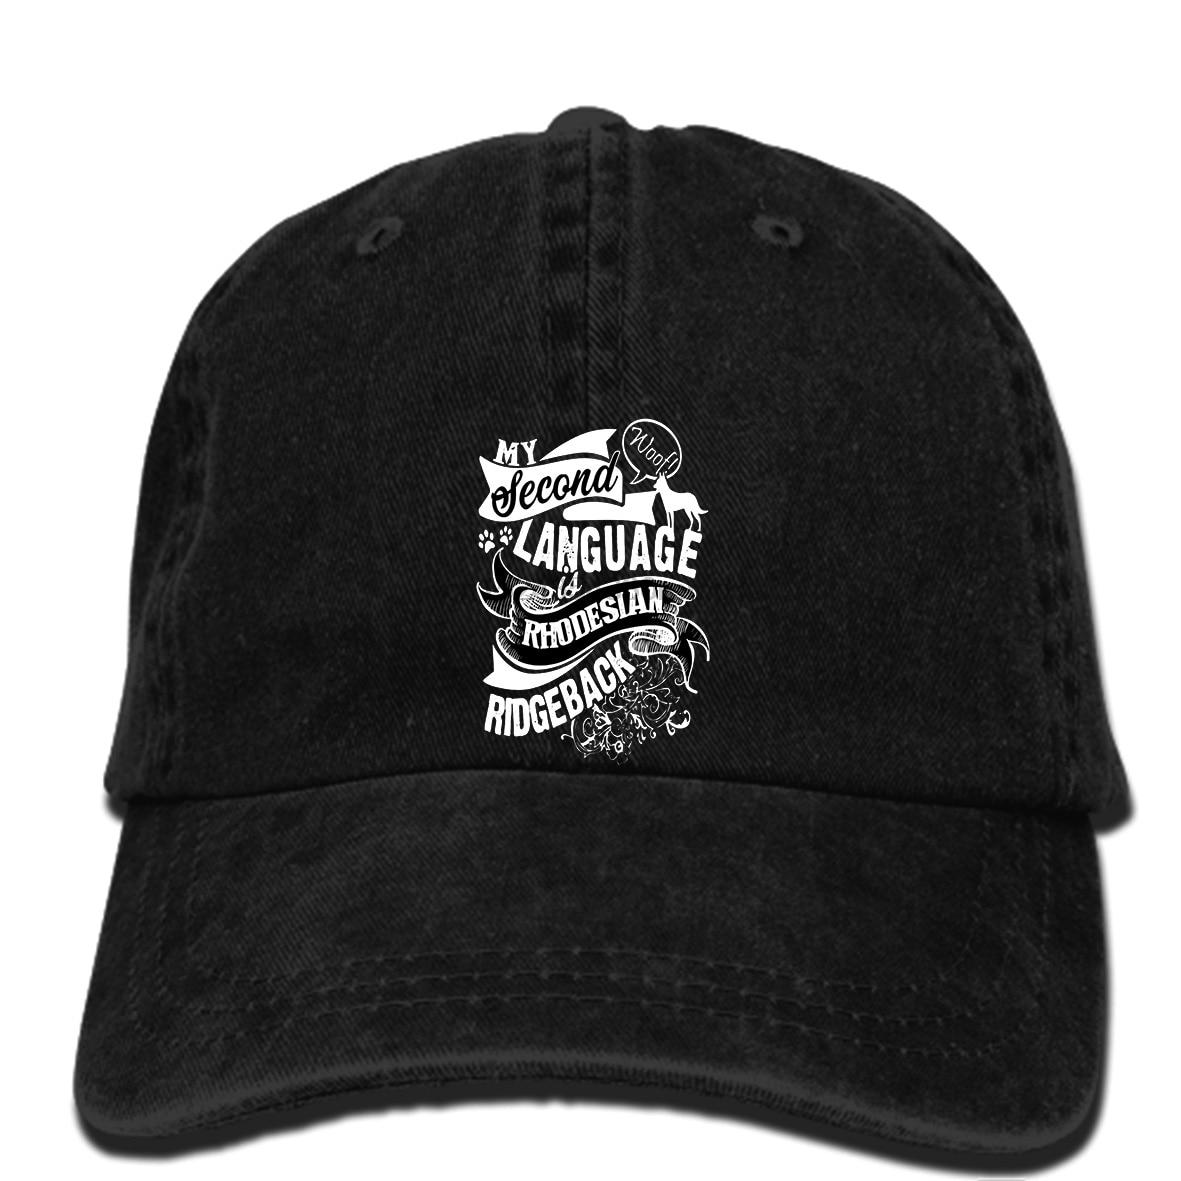 4567c158d75 Detail Feedback Questions about hip hop Baseball caps Funny Men hat Women  novelty Rhodesian Ridgeback Womens Tri Blend cap cool cap on Aliexpress.com  ...